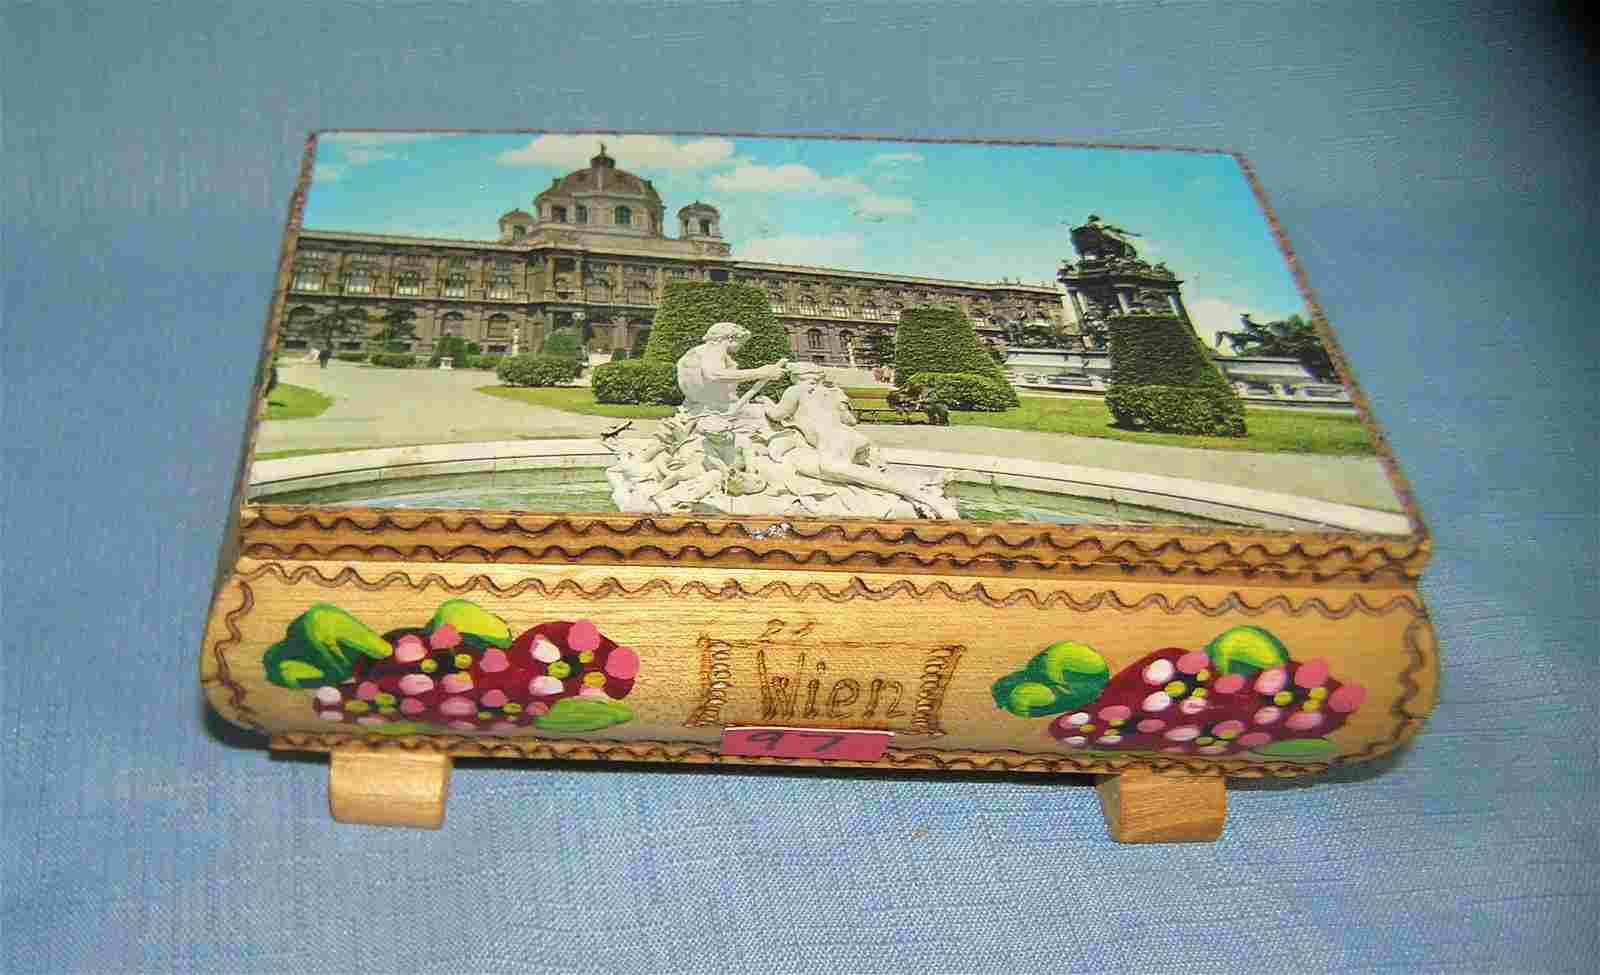 Hand painted Swiss mechanical musical jewelry box